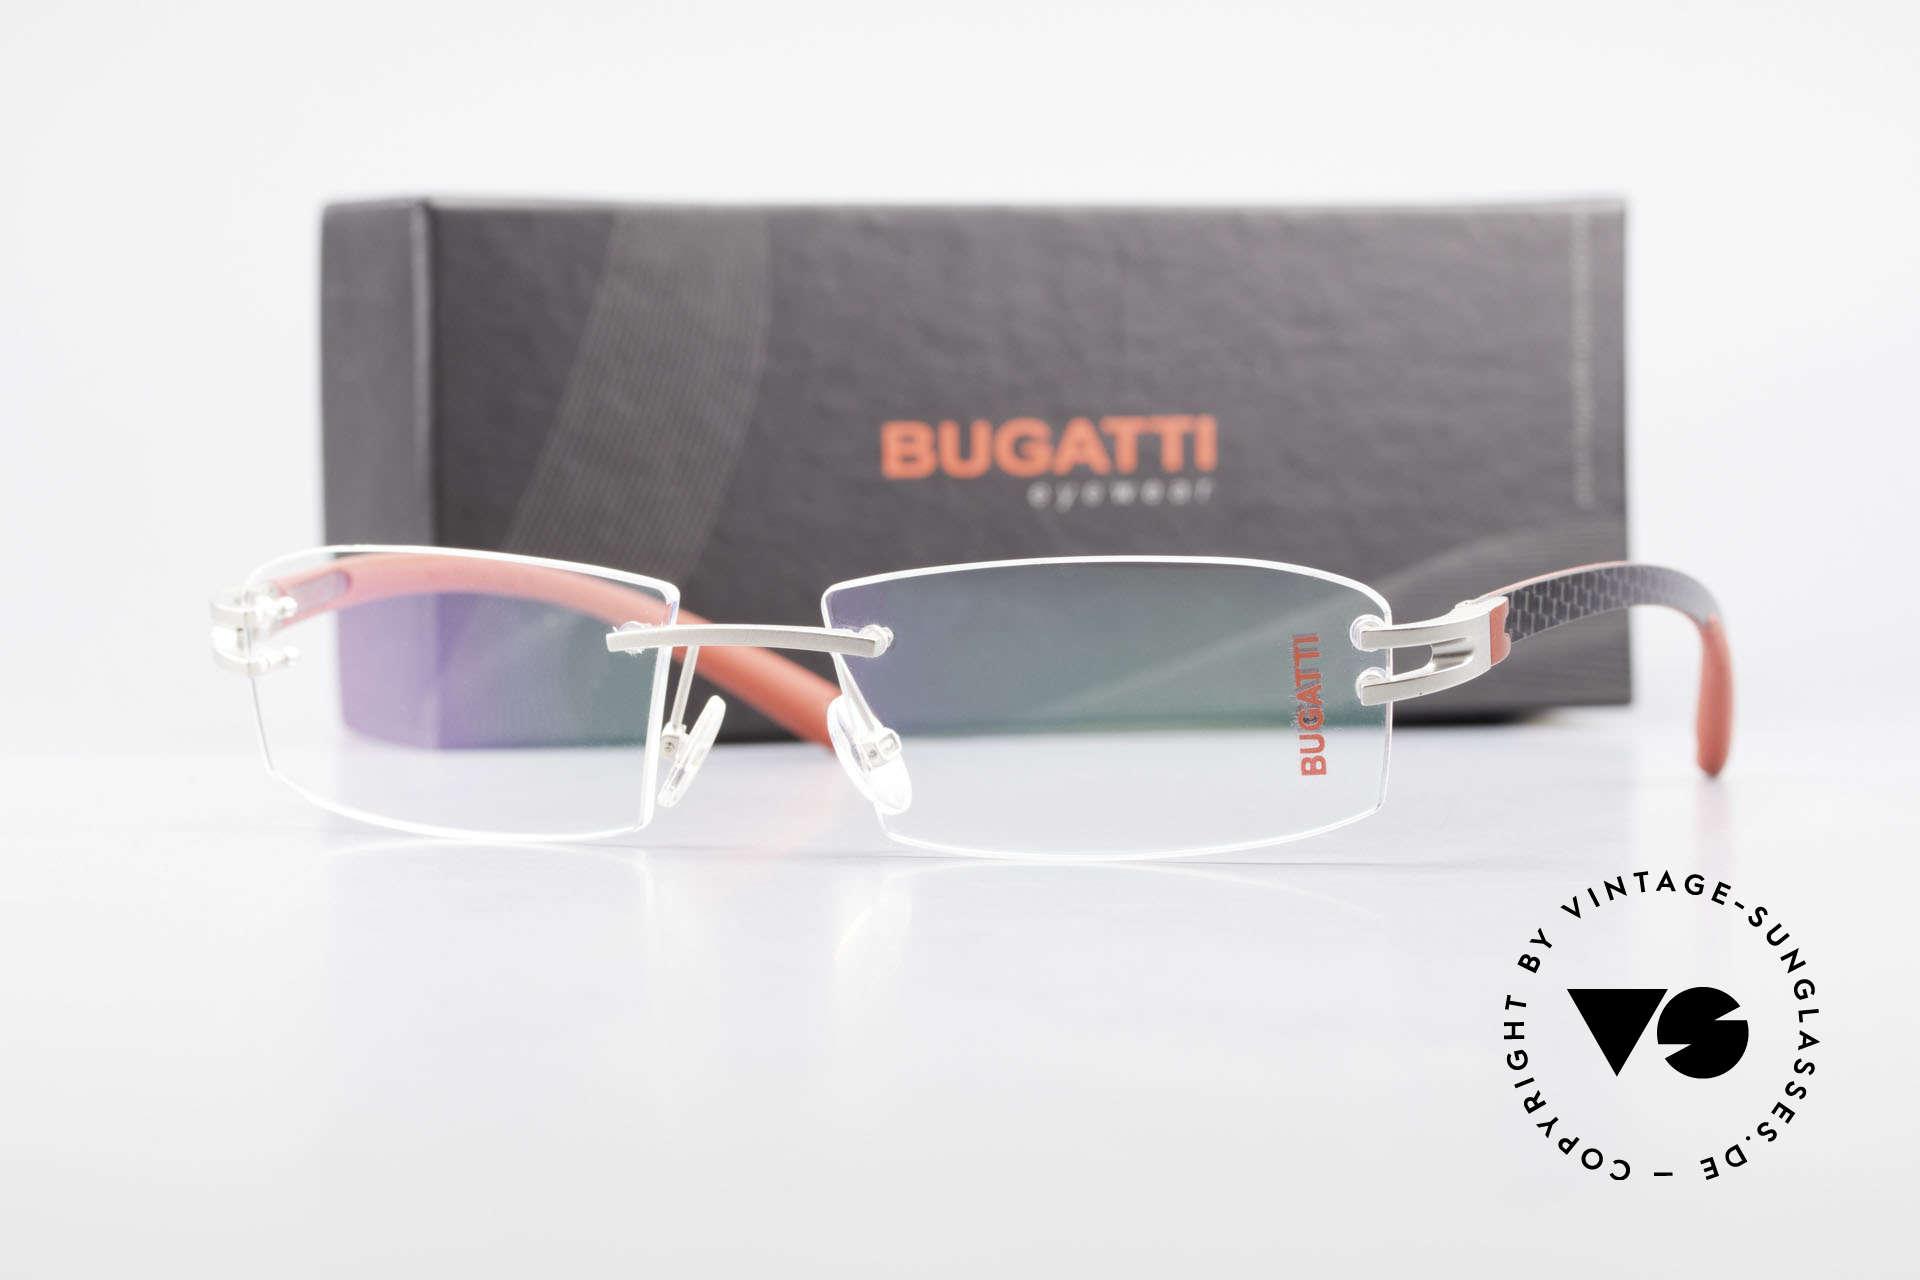 Bugatti 464 Rimless Luxury Frame Palladium, Size: medium, Made for Men